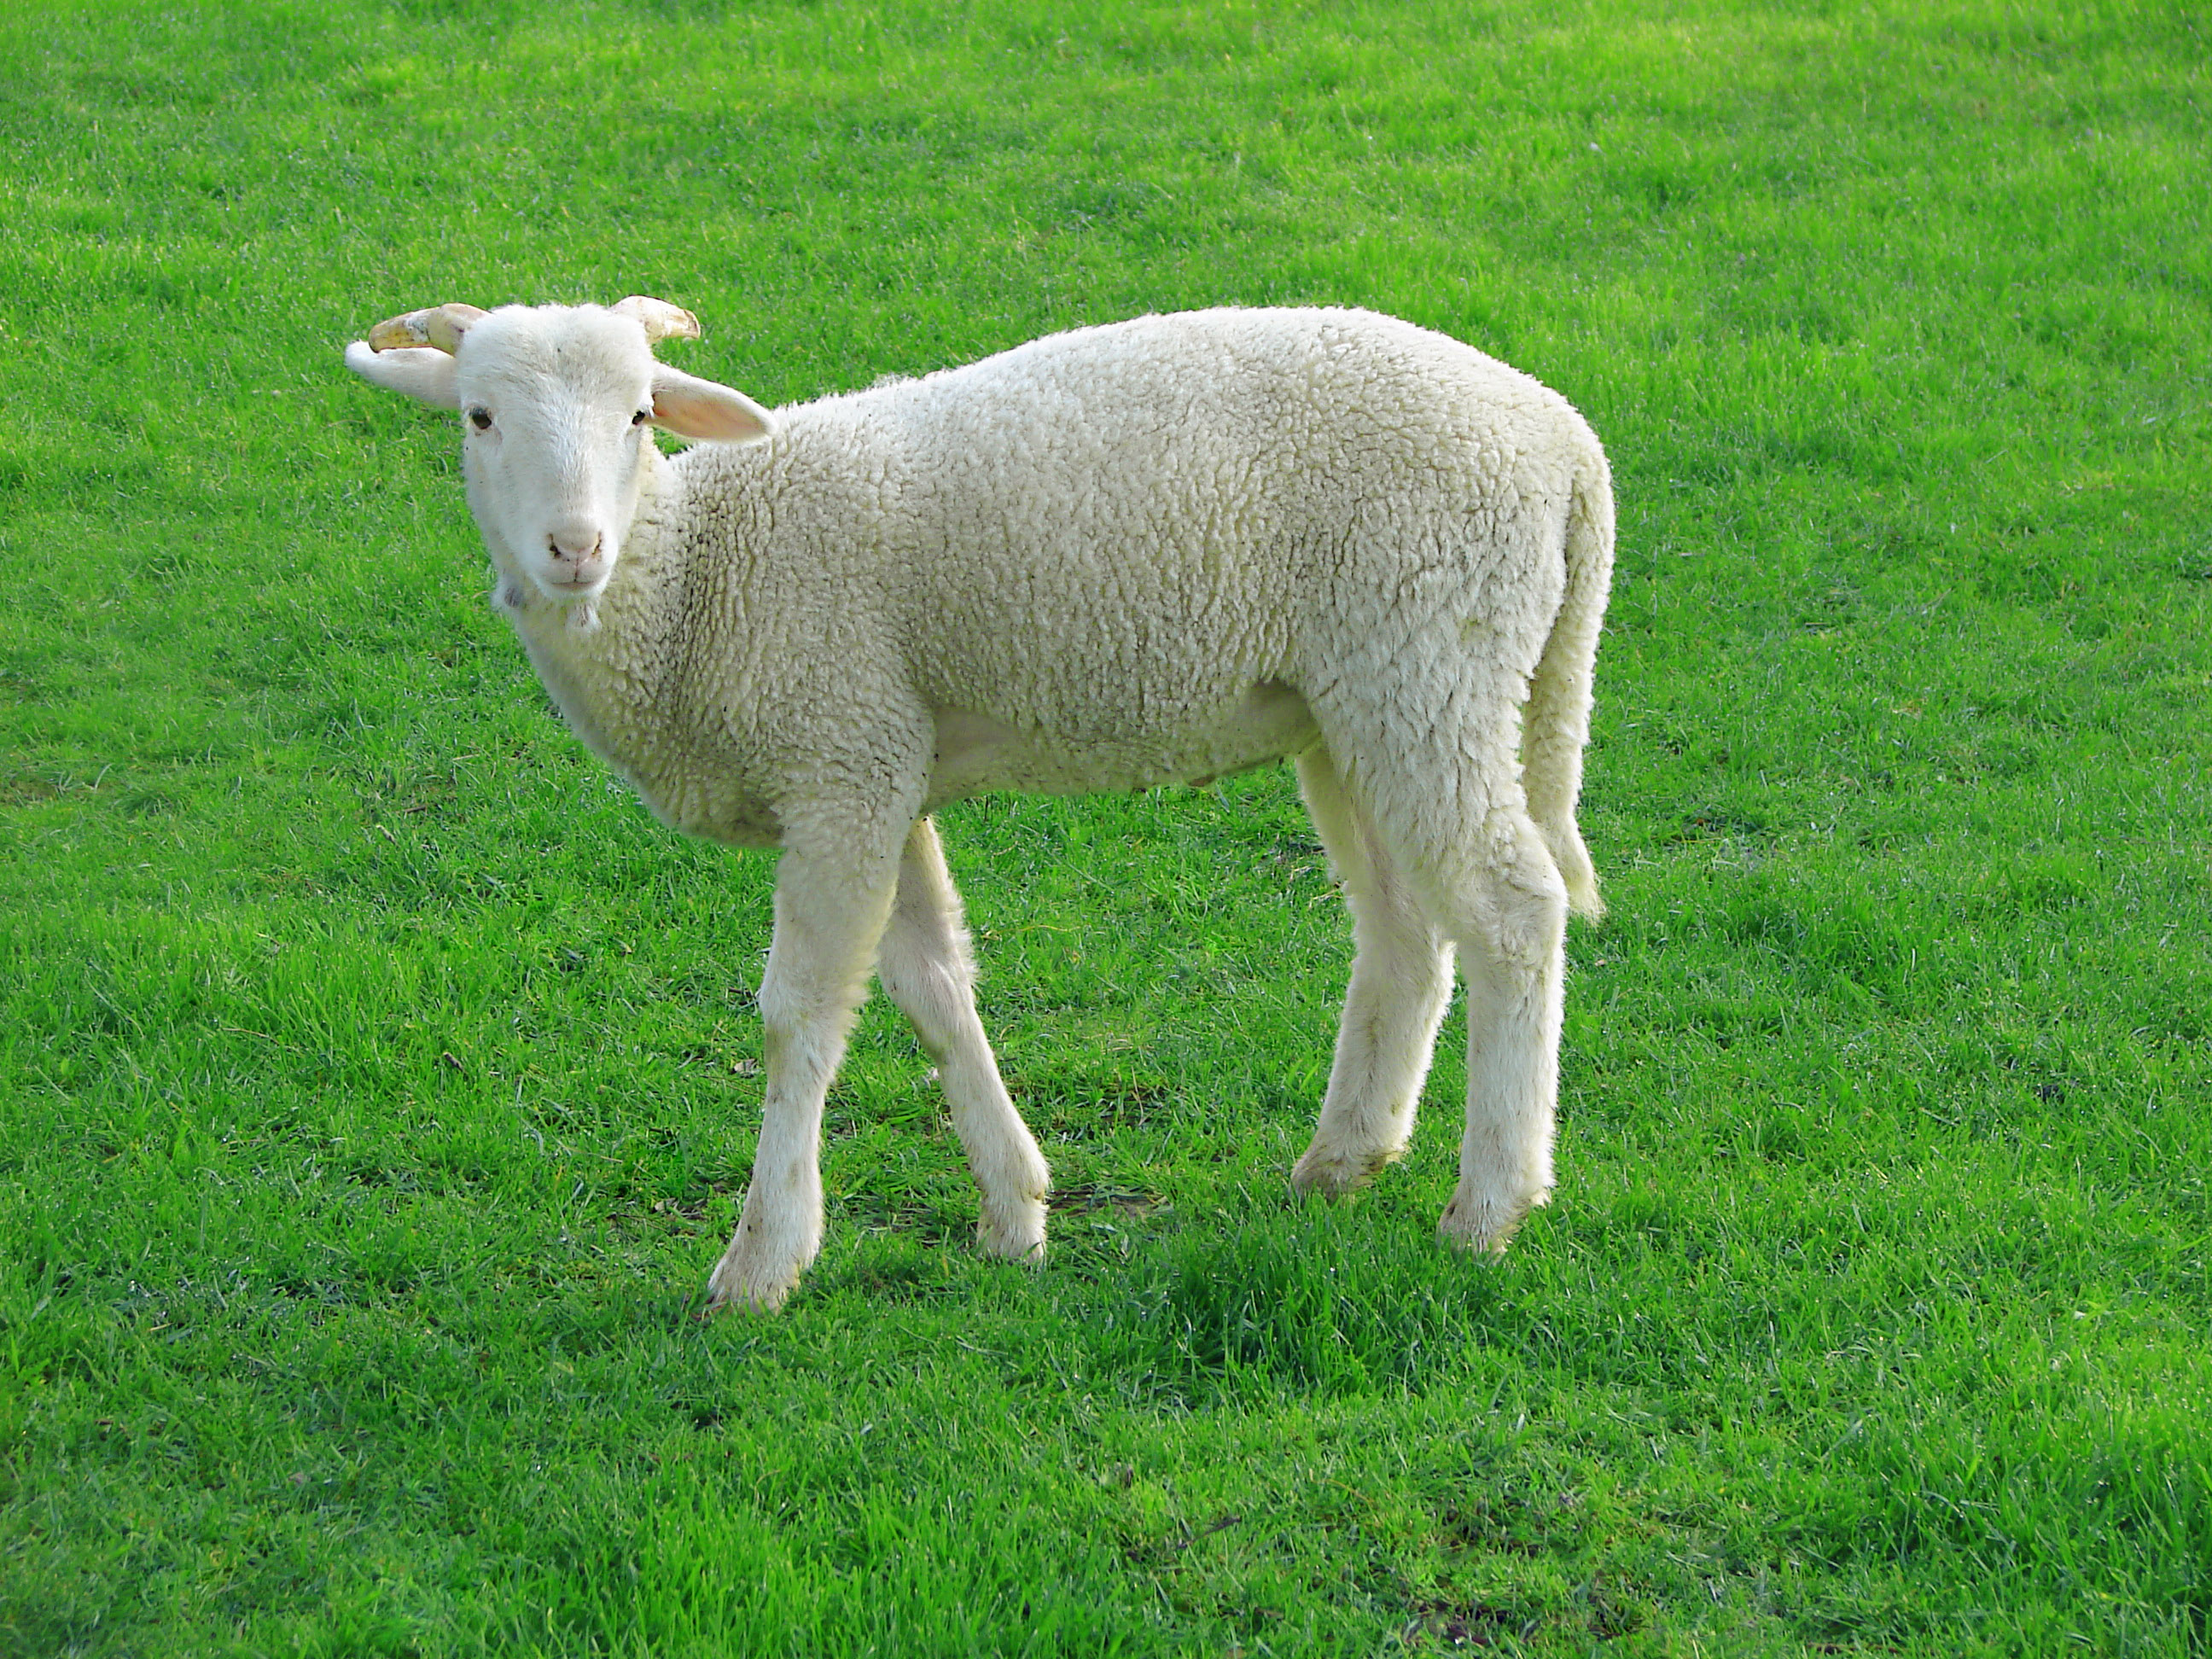 File:Lamb 09807-a.jpg - Wikimedia Commons